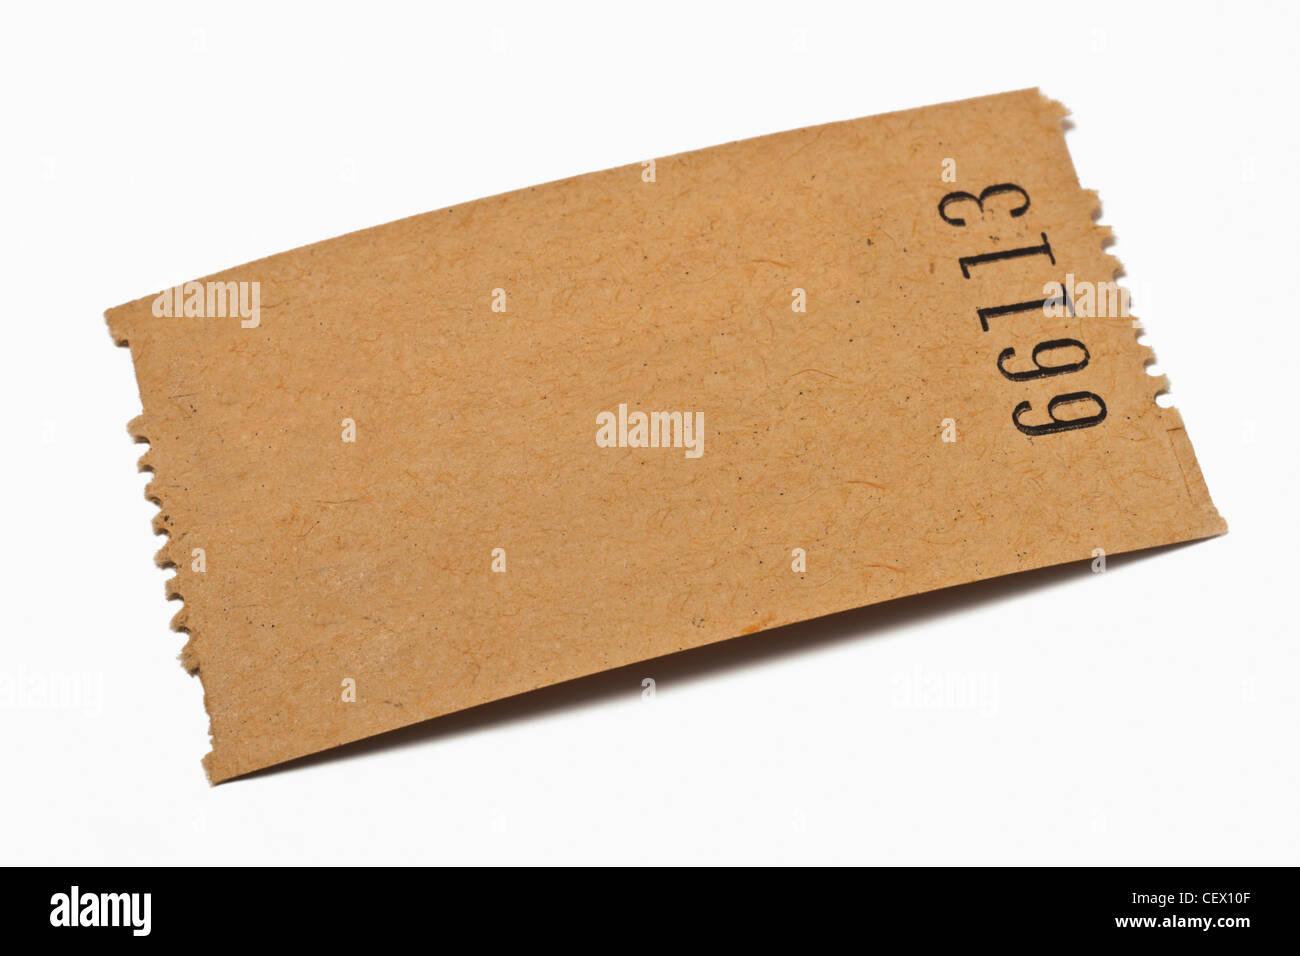 Detailansicht einer Karte aus Papier ohne Aufschrift | Detail photo of a paper card without inscription - Stock Image